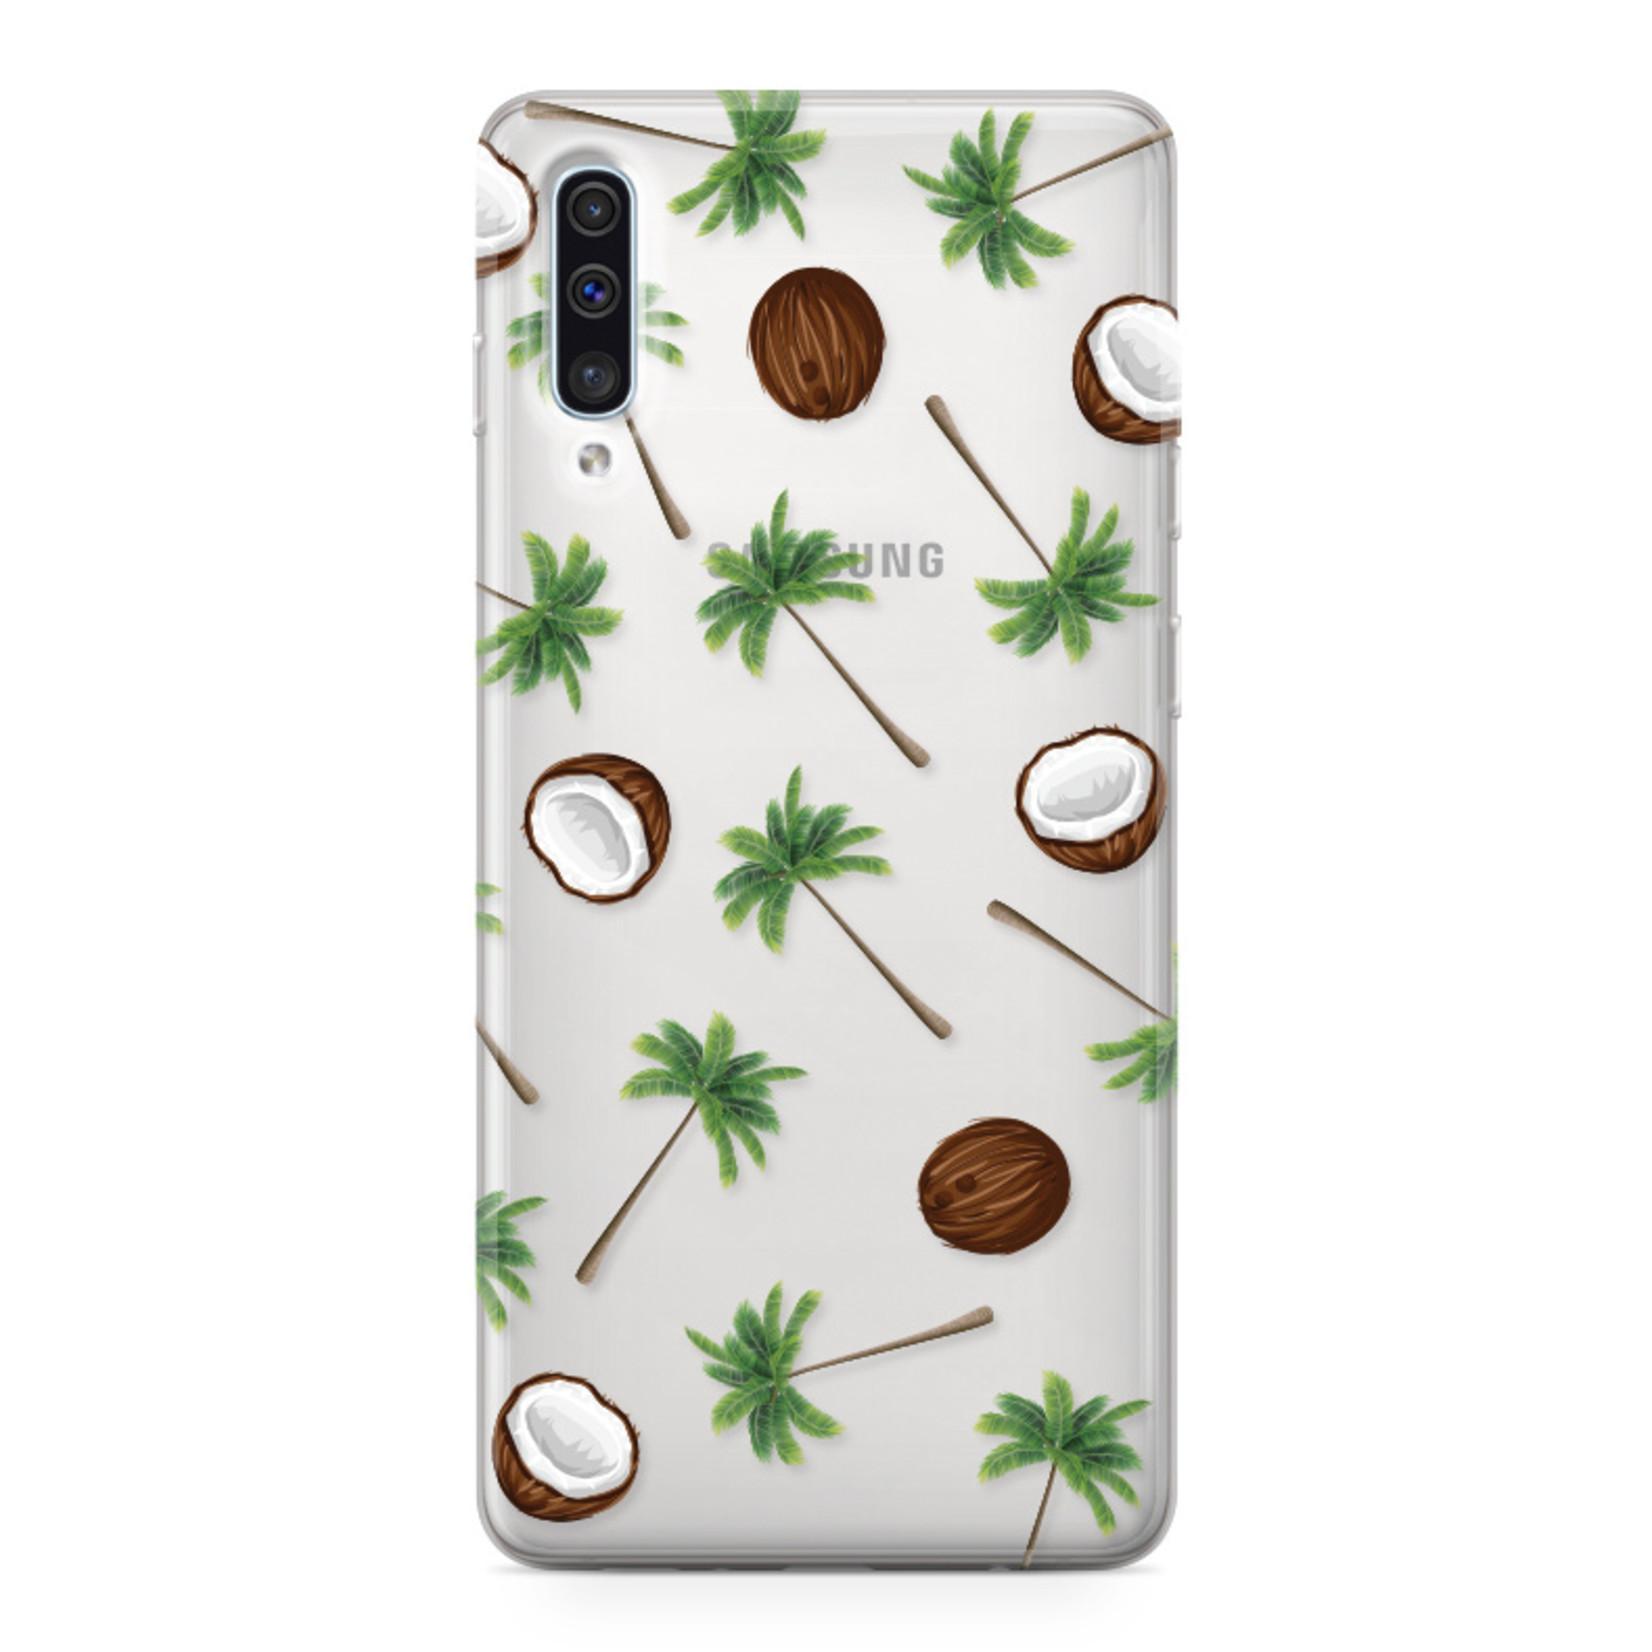 FOONCASE Samsung Galaxy A50 hoesje TPU Soft Case - Back Cover - Coco Paradise / Kokosnoot / Palmboom